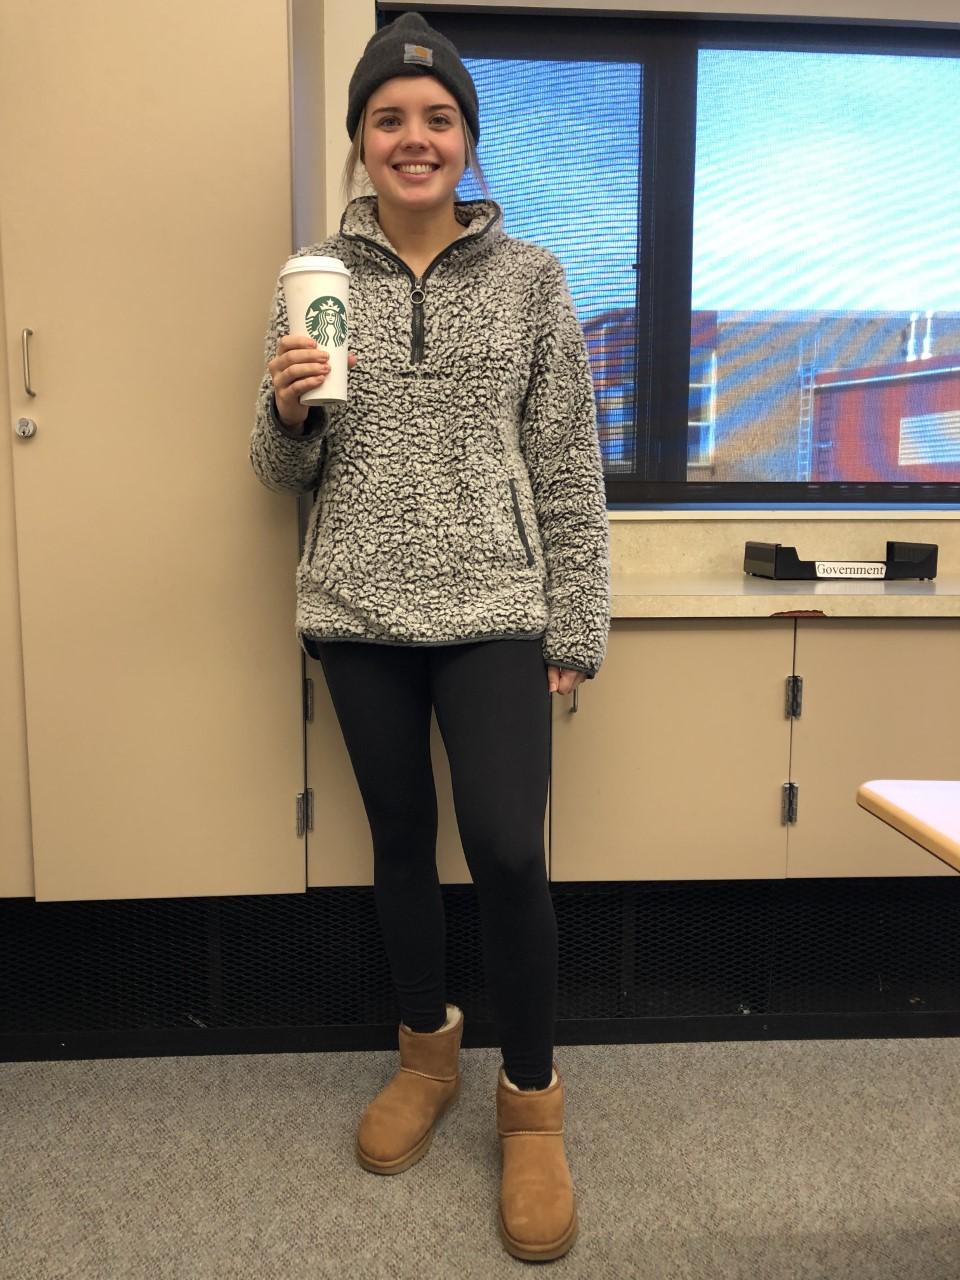 Kaylee wearing the Classic Mini Ugg's, a Carhartt Beanie, drinking a warm oat milk latte.